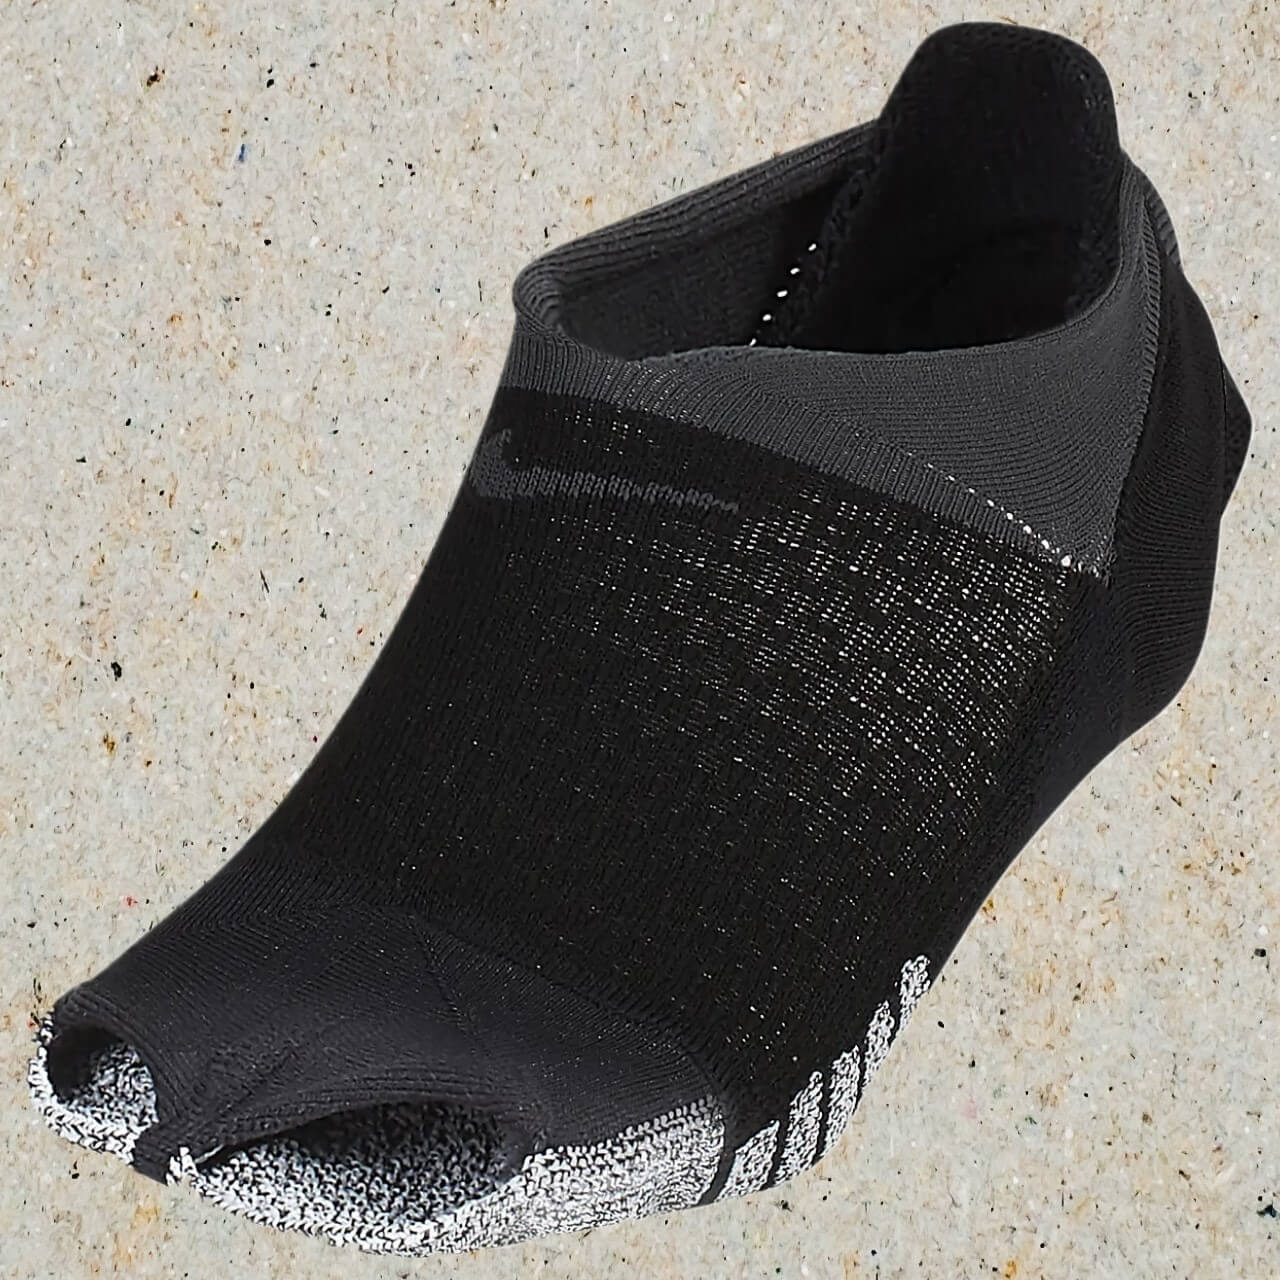 NikeGrip studio grip footie socks for yoga and meditation.